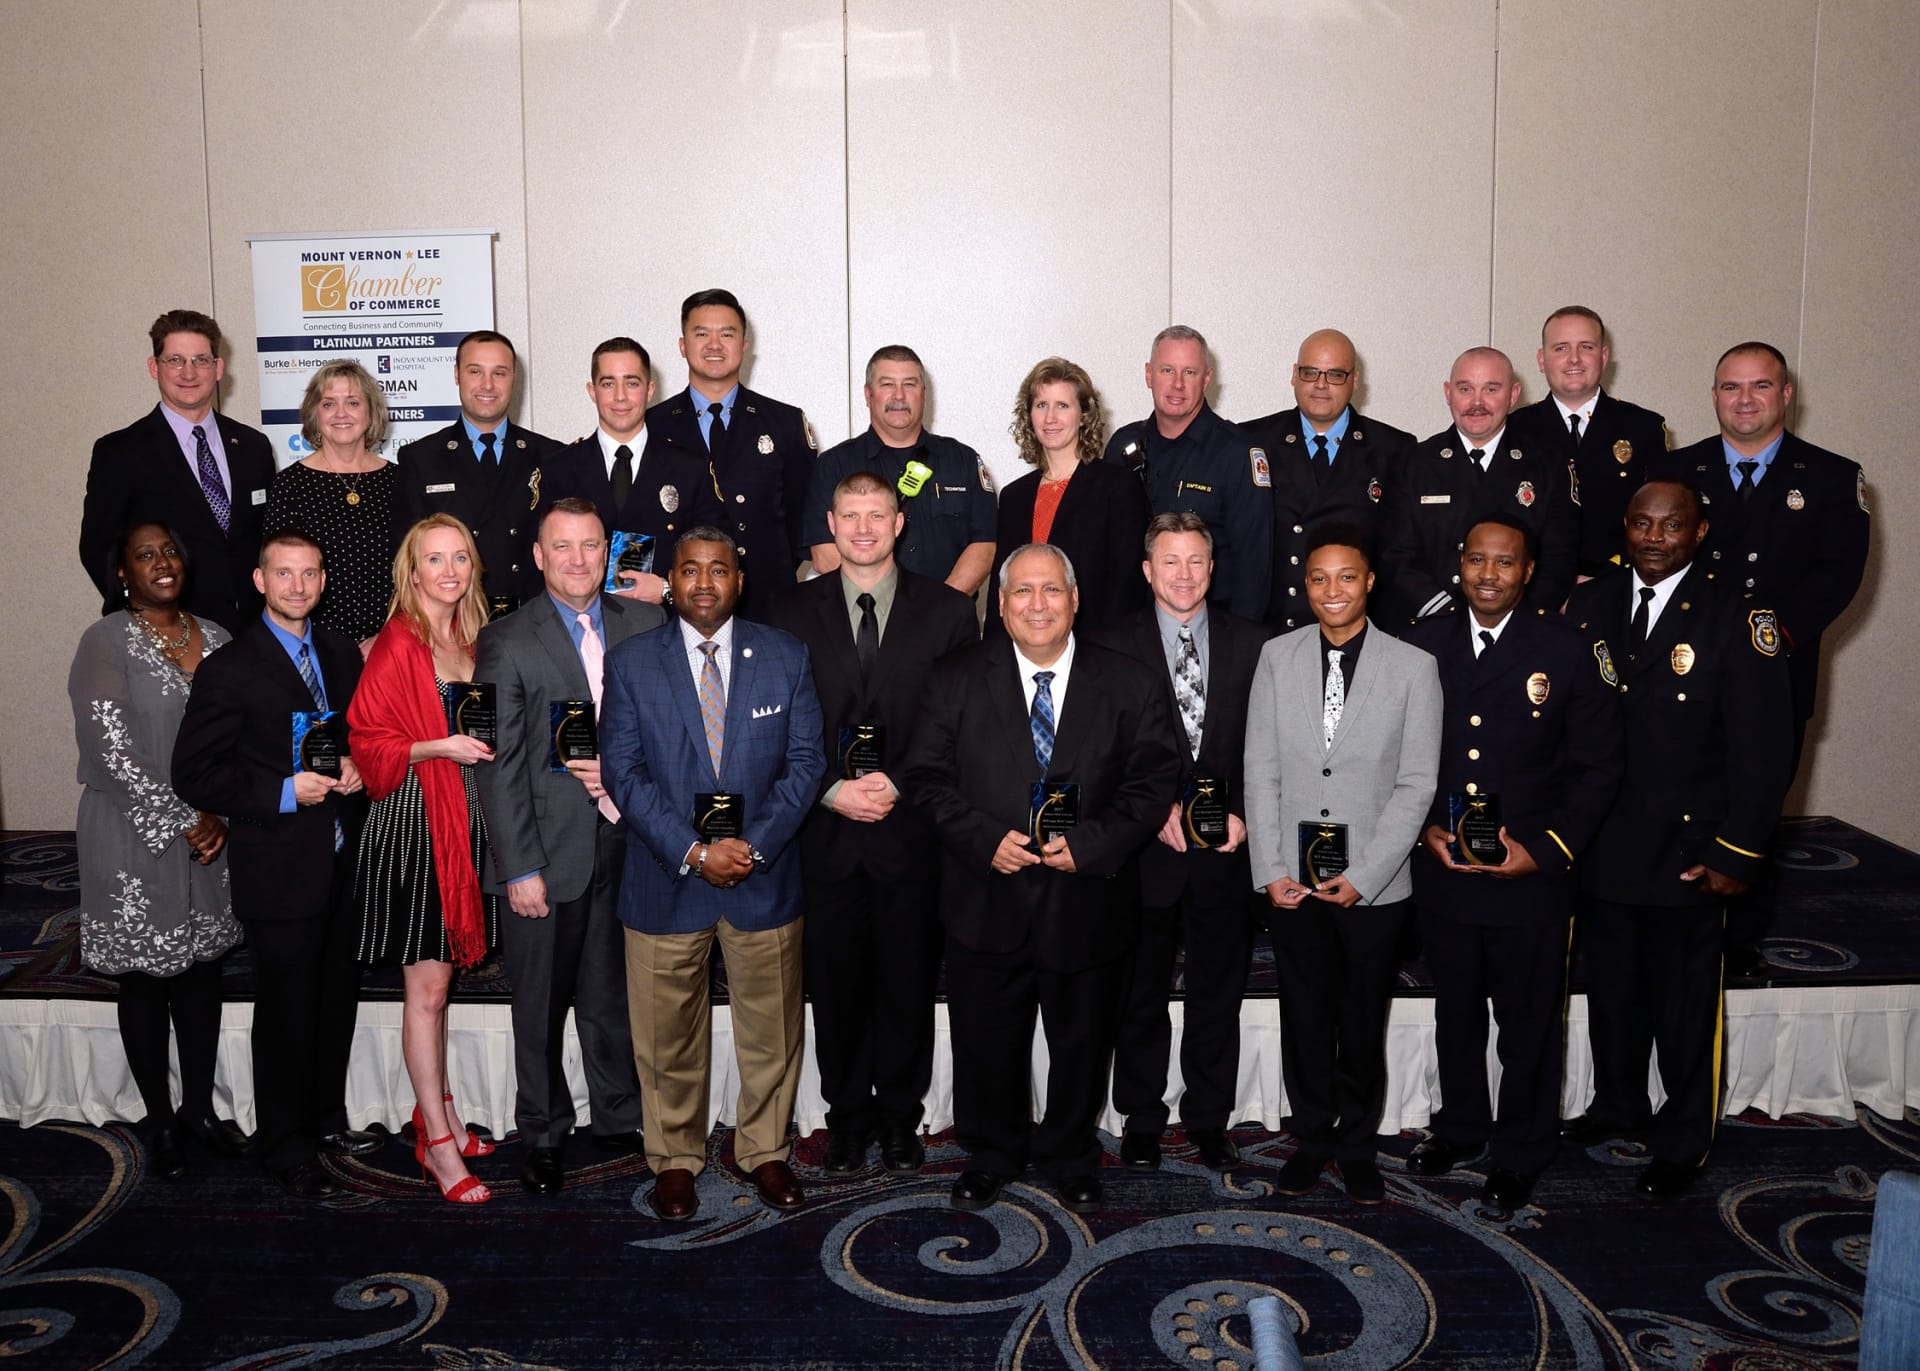 MVLC-Awards17-369t.JPG-w1920.jpg